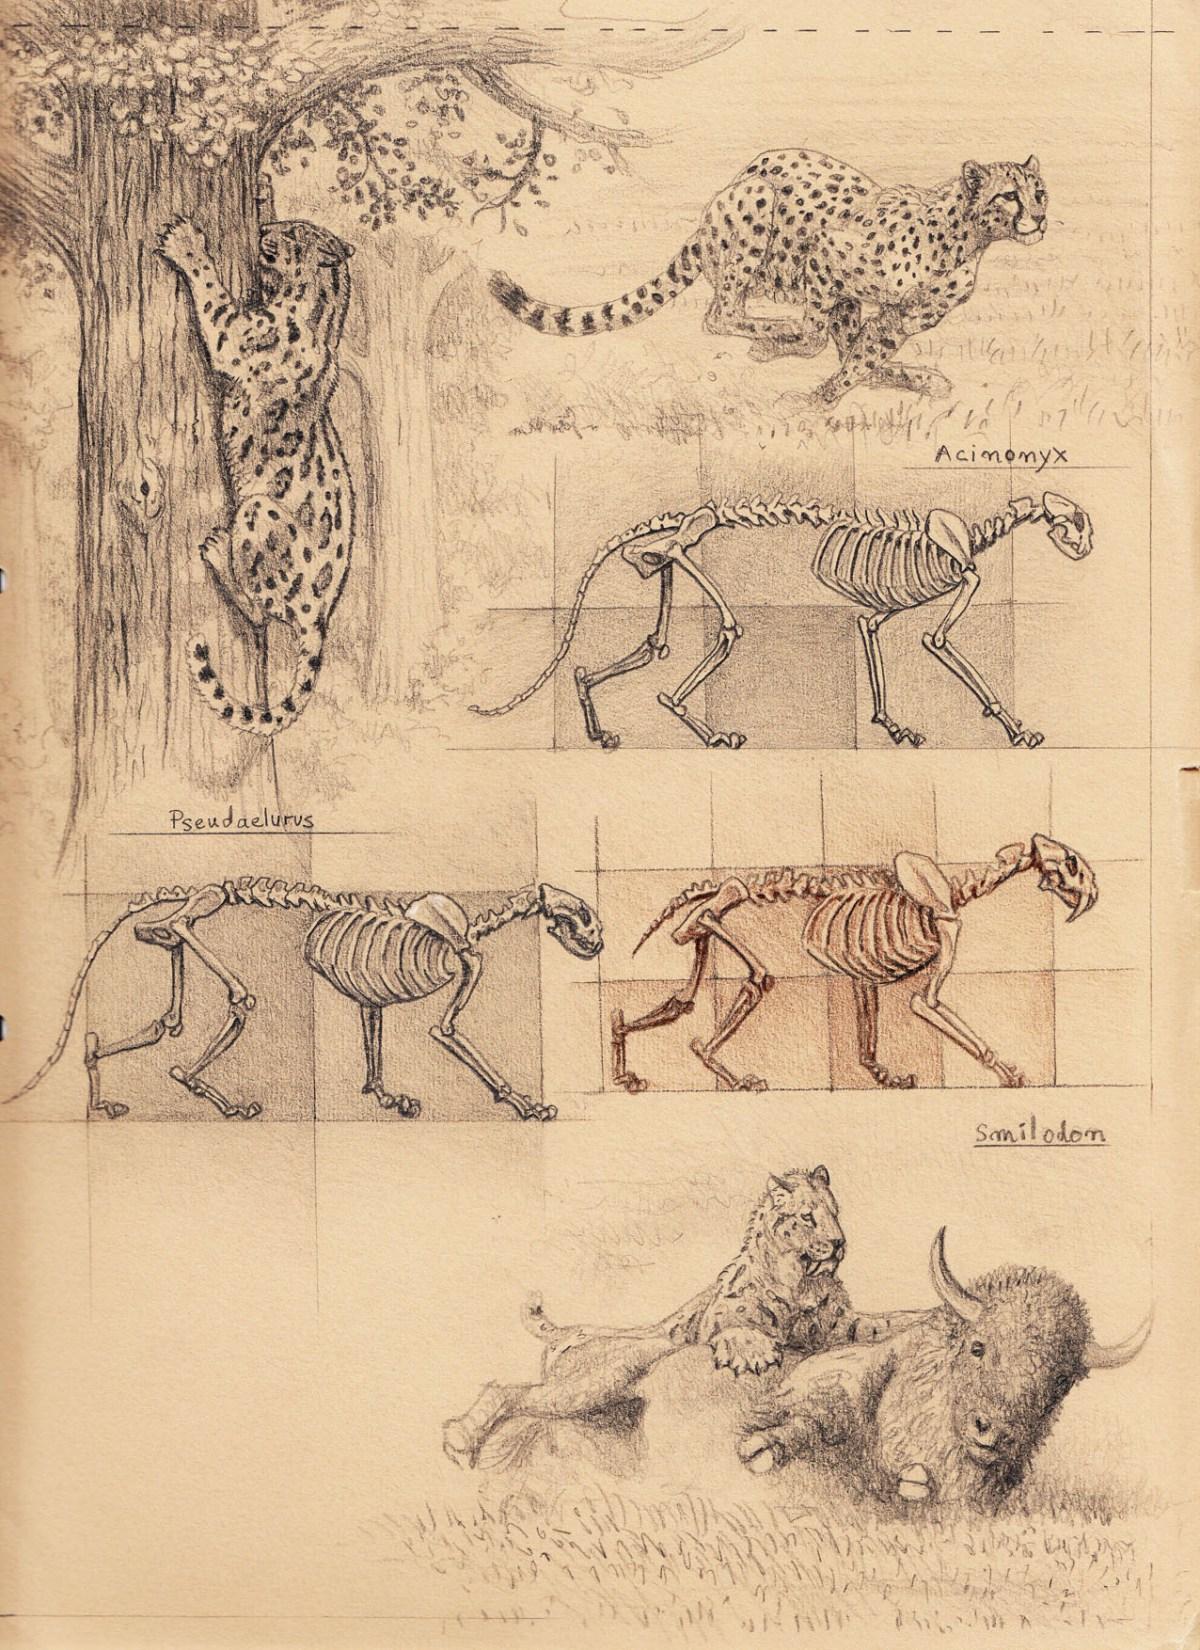 Drawn hunting cheetah Diaries Artist old Sabertooth 1: